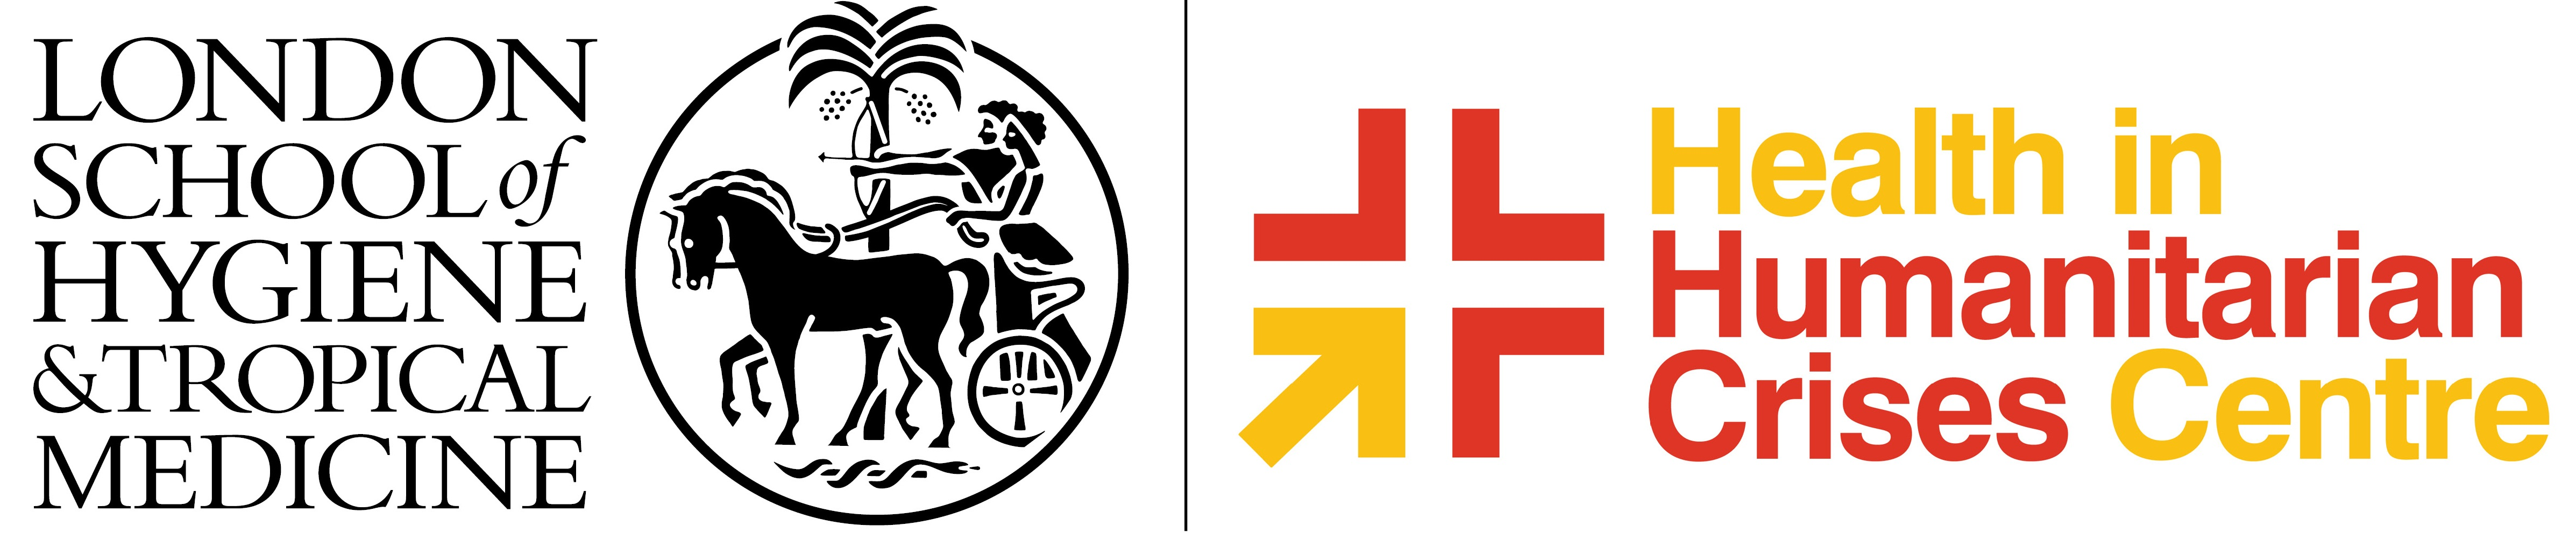 lshtm logo and health in humanitarian crises logo